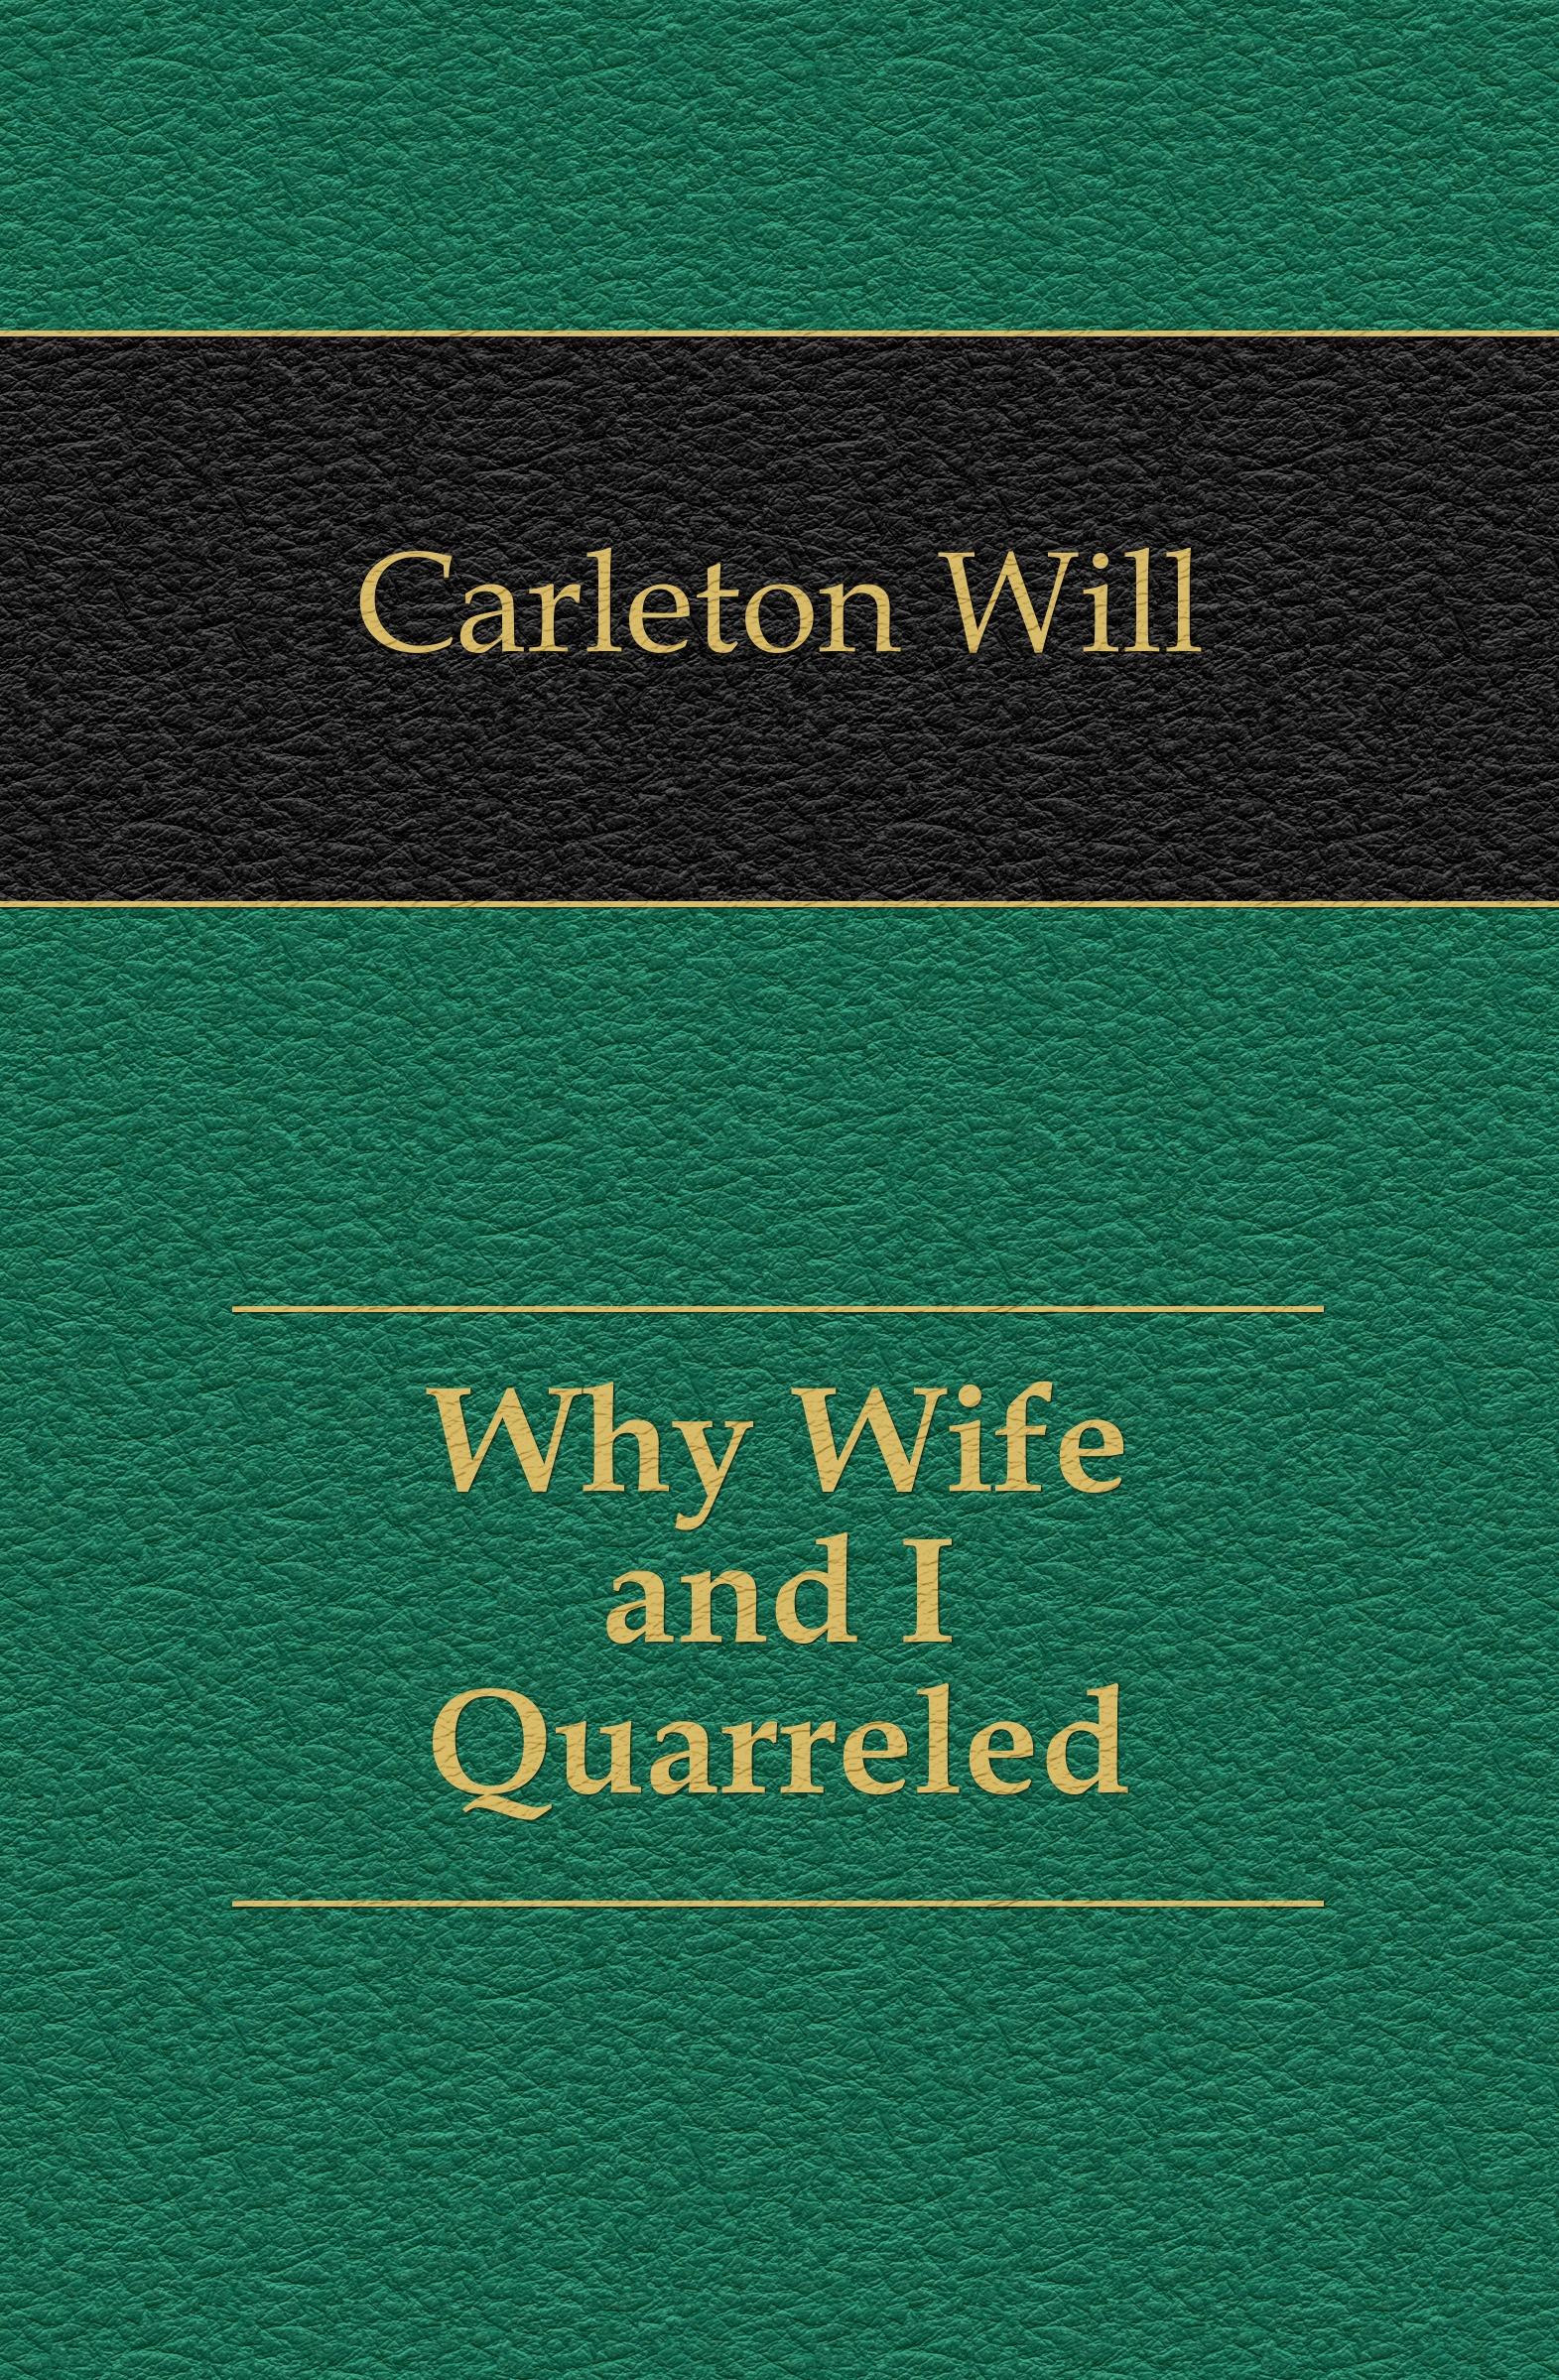 Carleton Will Why Wife and I Quarreled